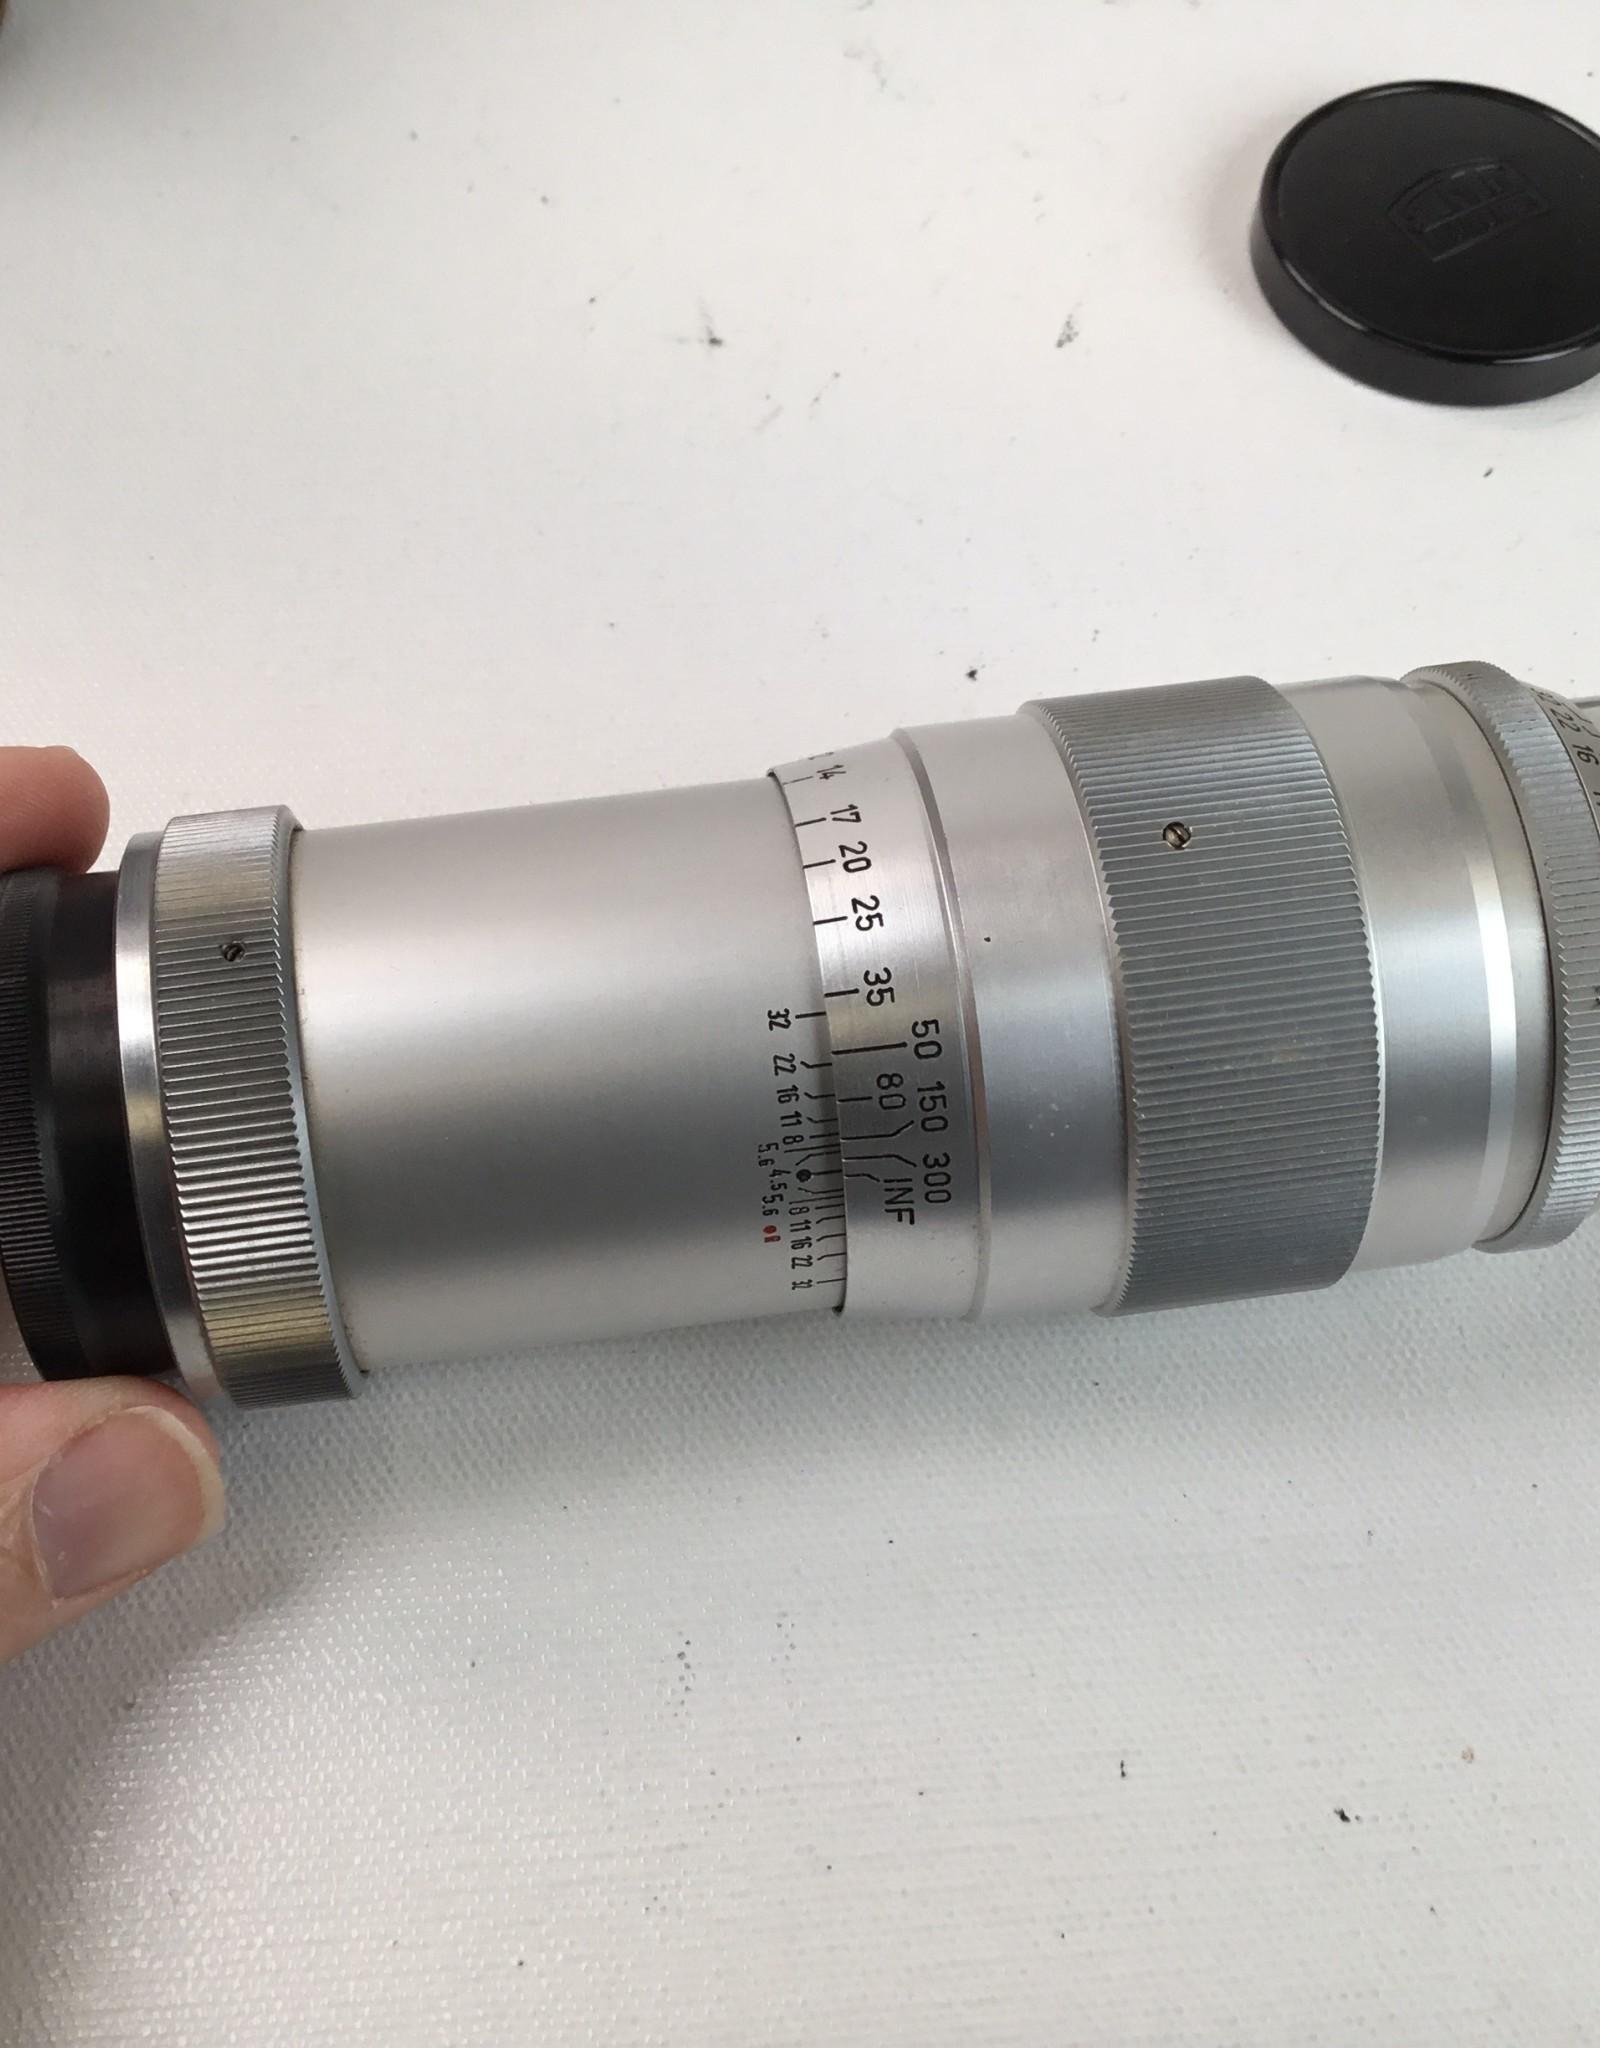 Leica Steinheil 135mm 4.5 Culminar LTM Lens w/ Case AS IS Used